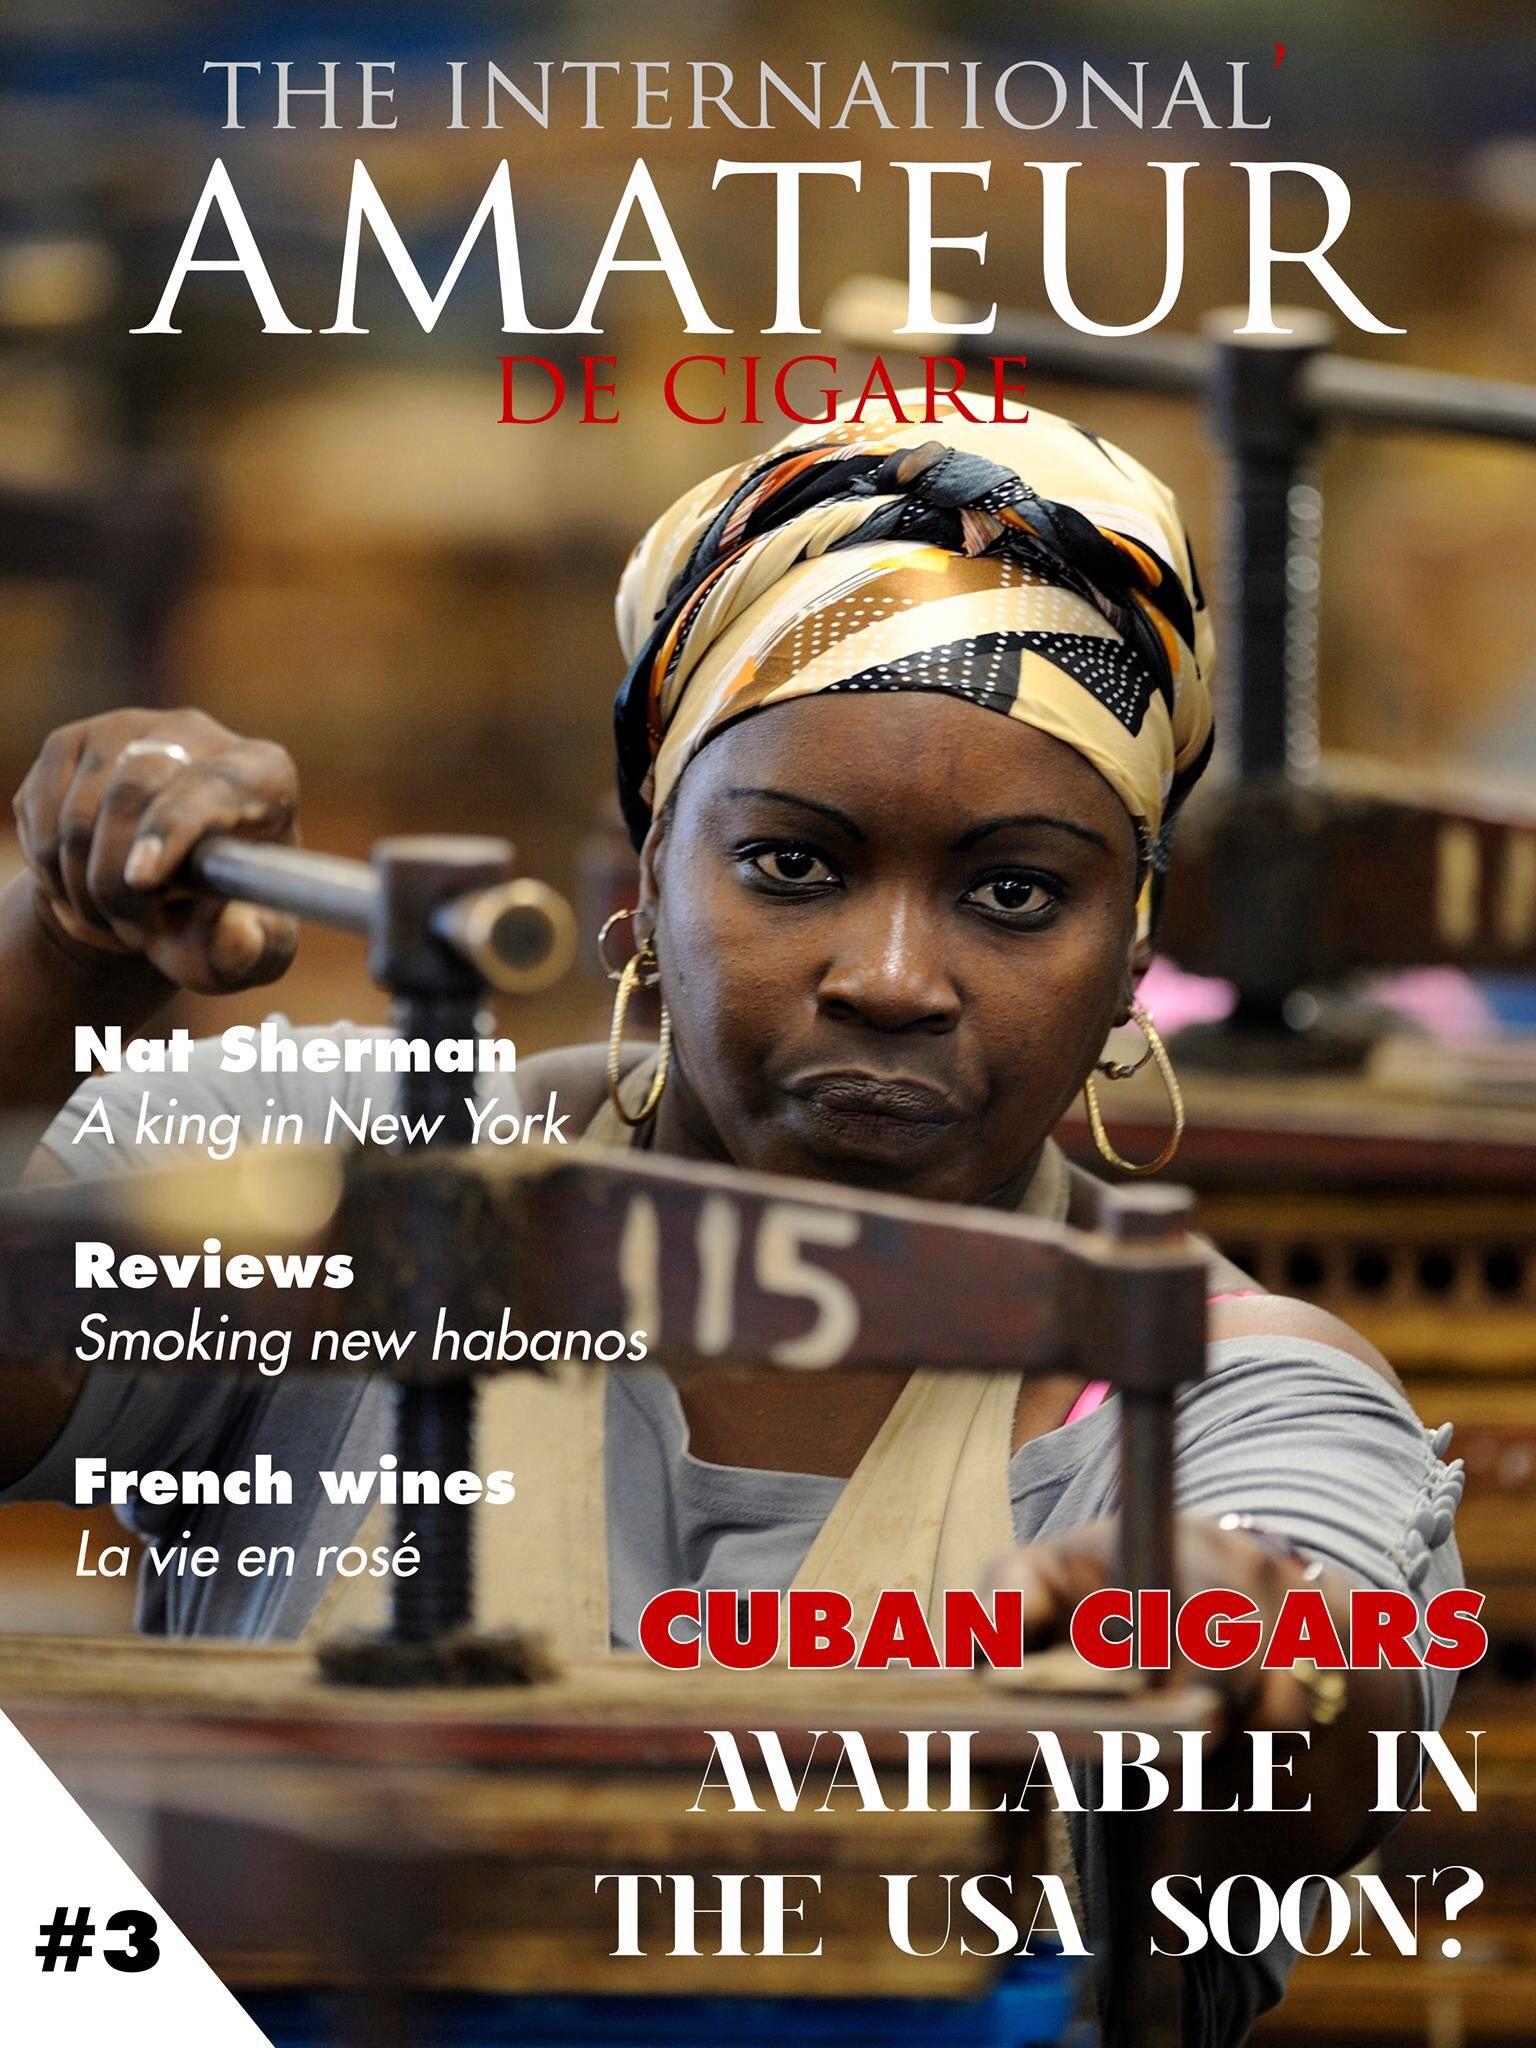 the_international_amateur_de_cigare_cigarmonkeys_4.jpg